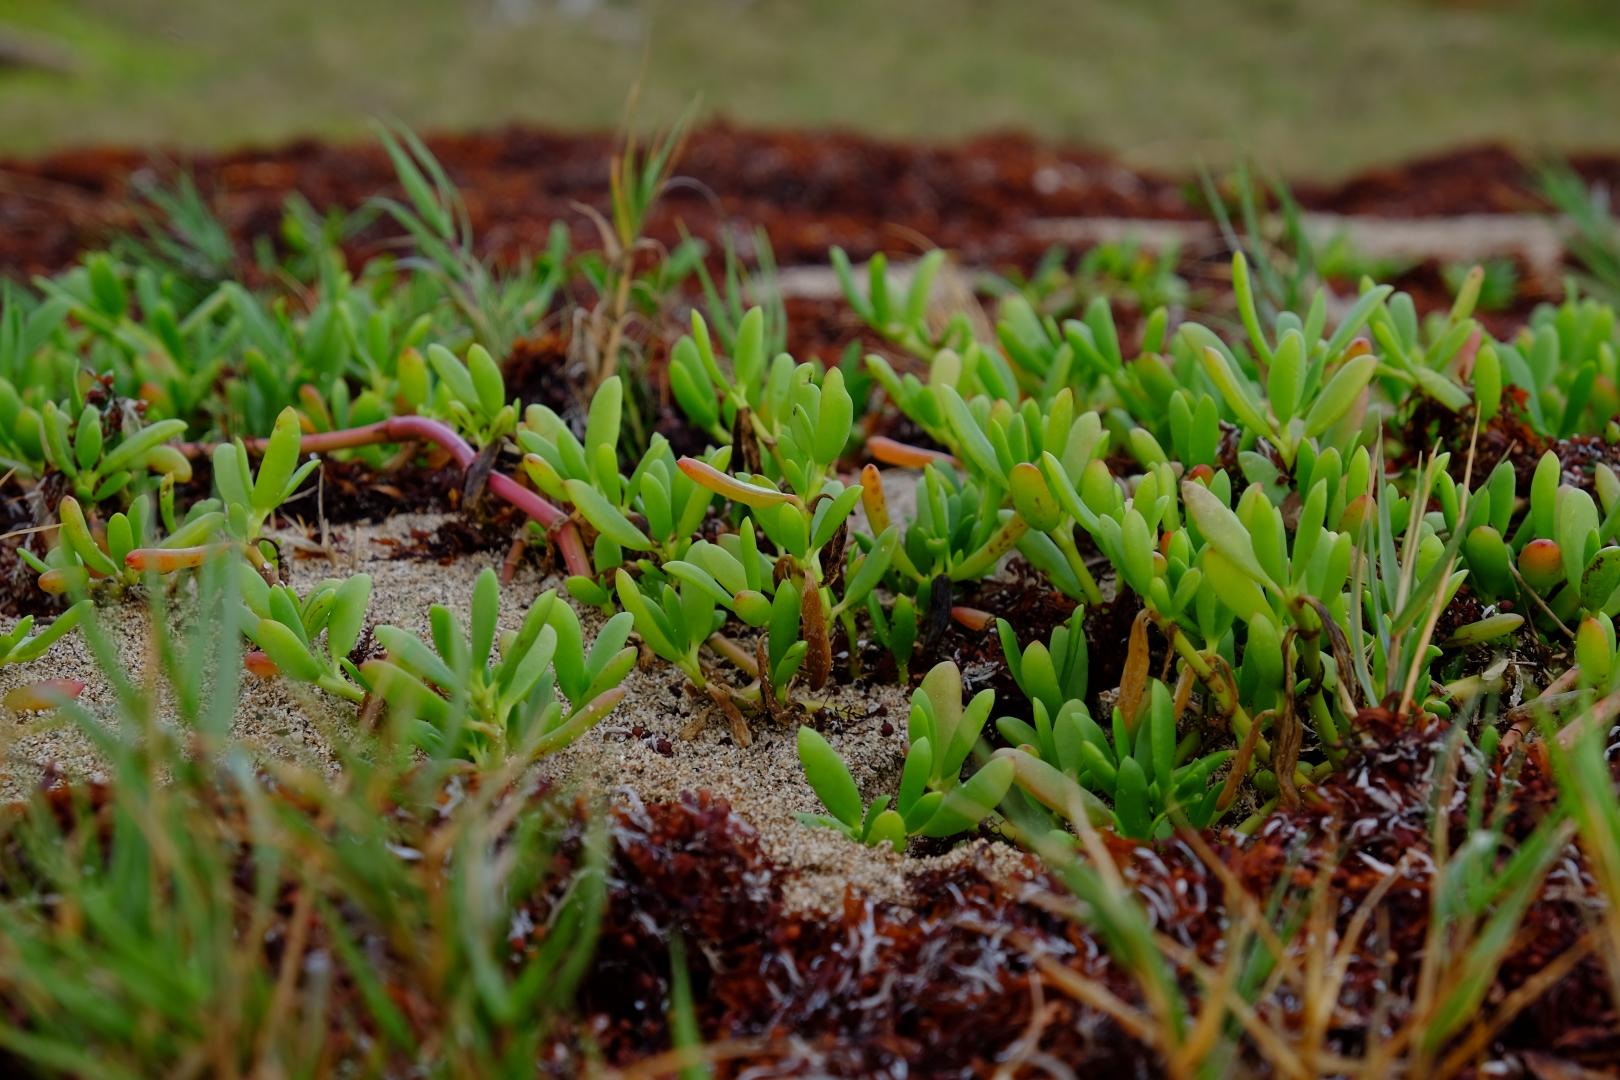 saint lucia wild foraging edible plants purslane samphire